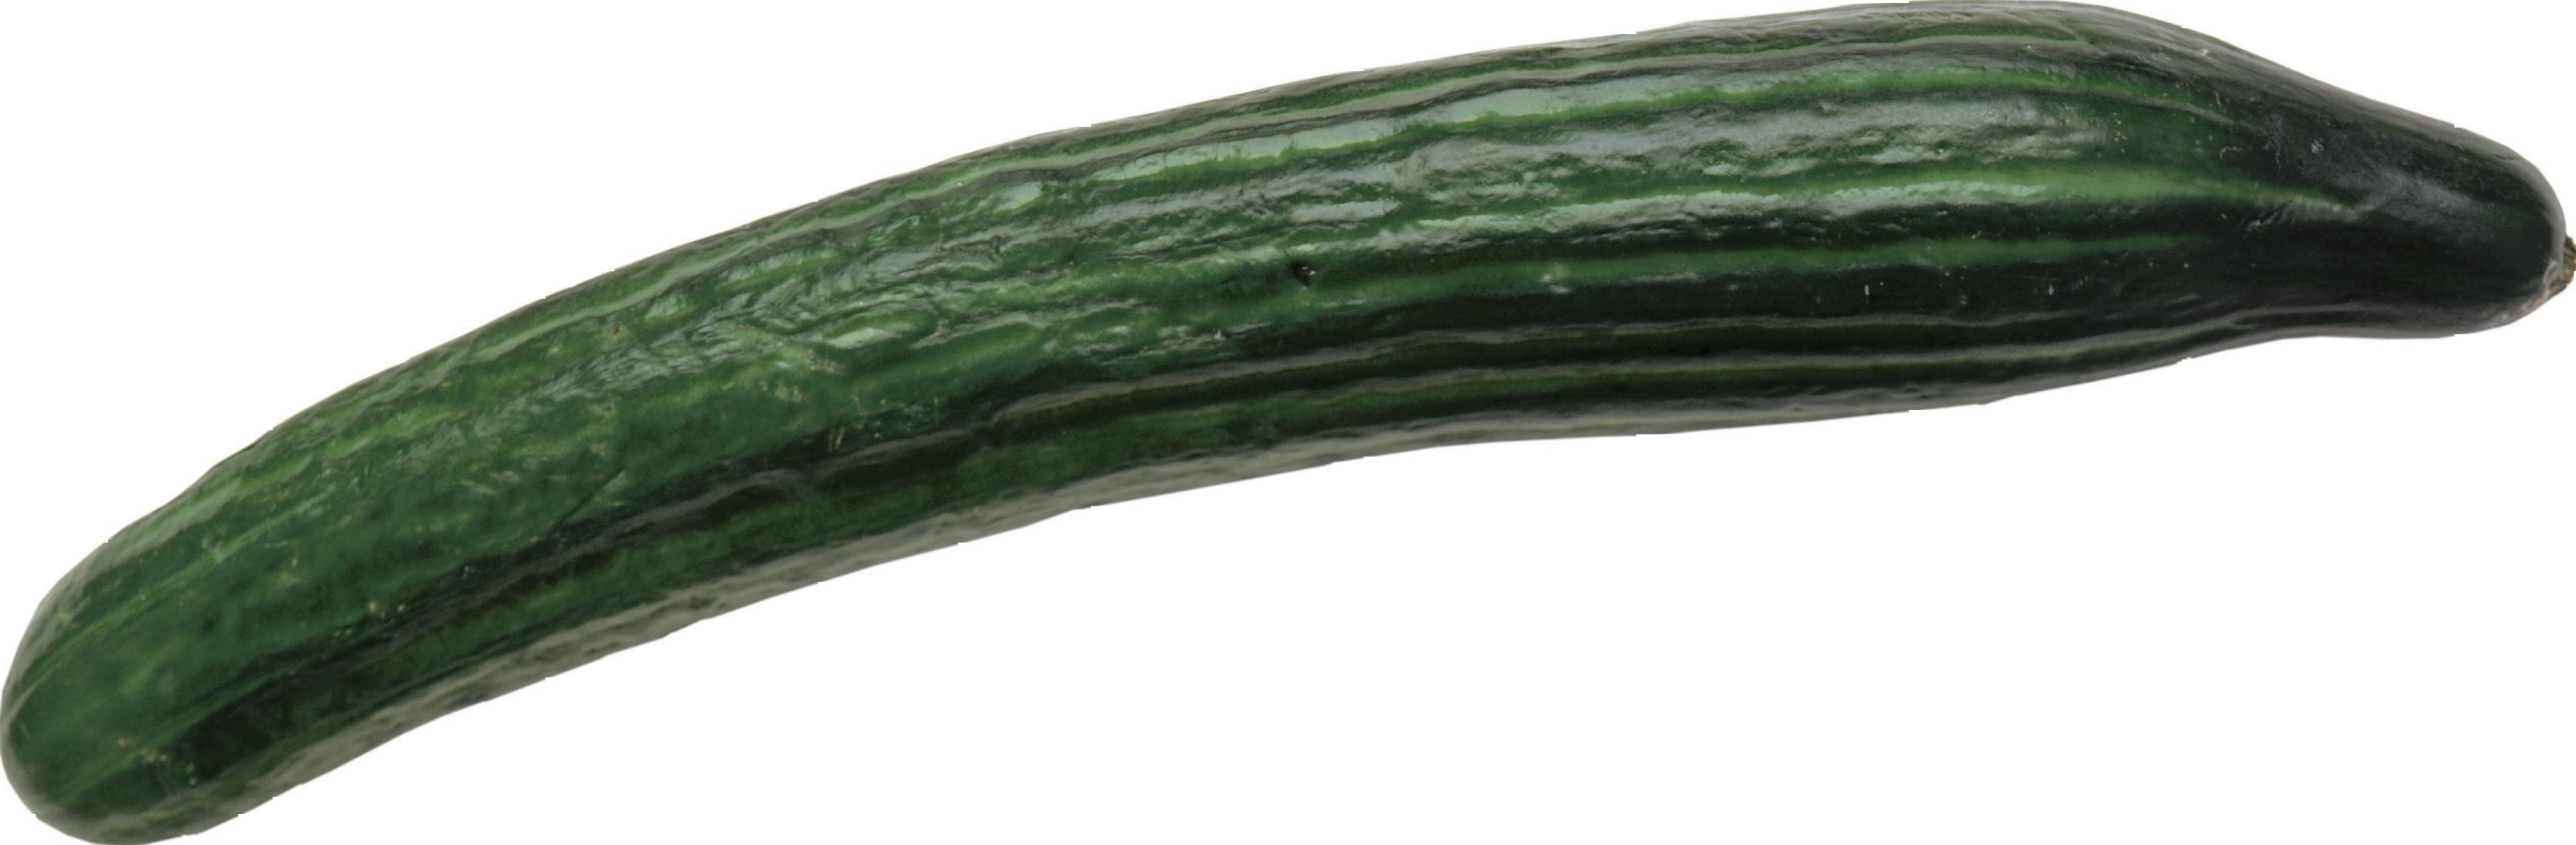 cucumber png clip art with transparent background clipart with transparent background on a cd